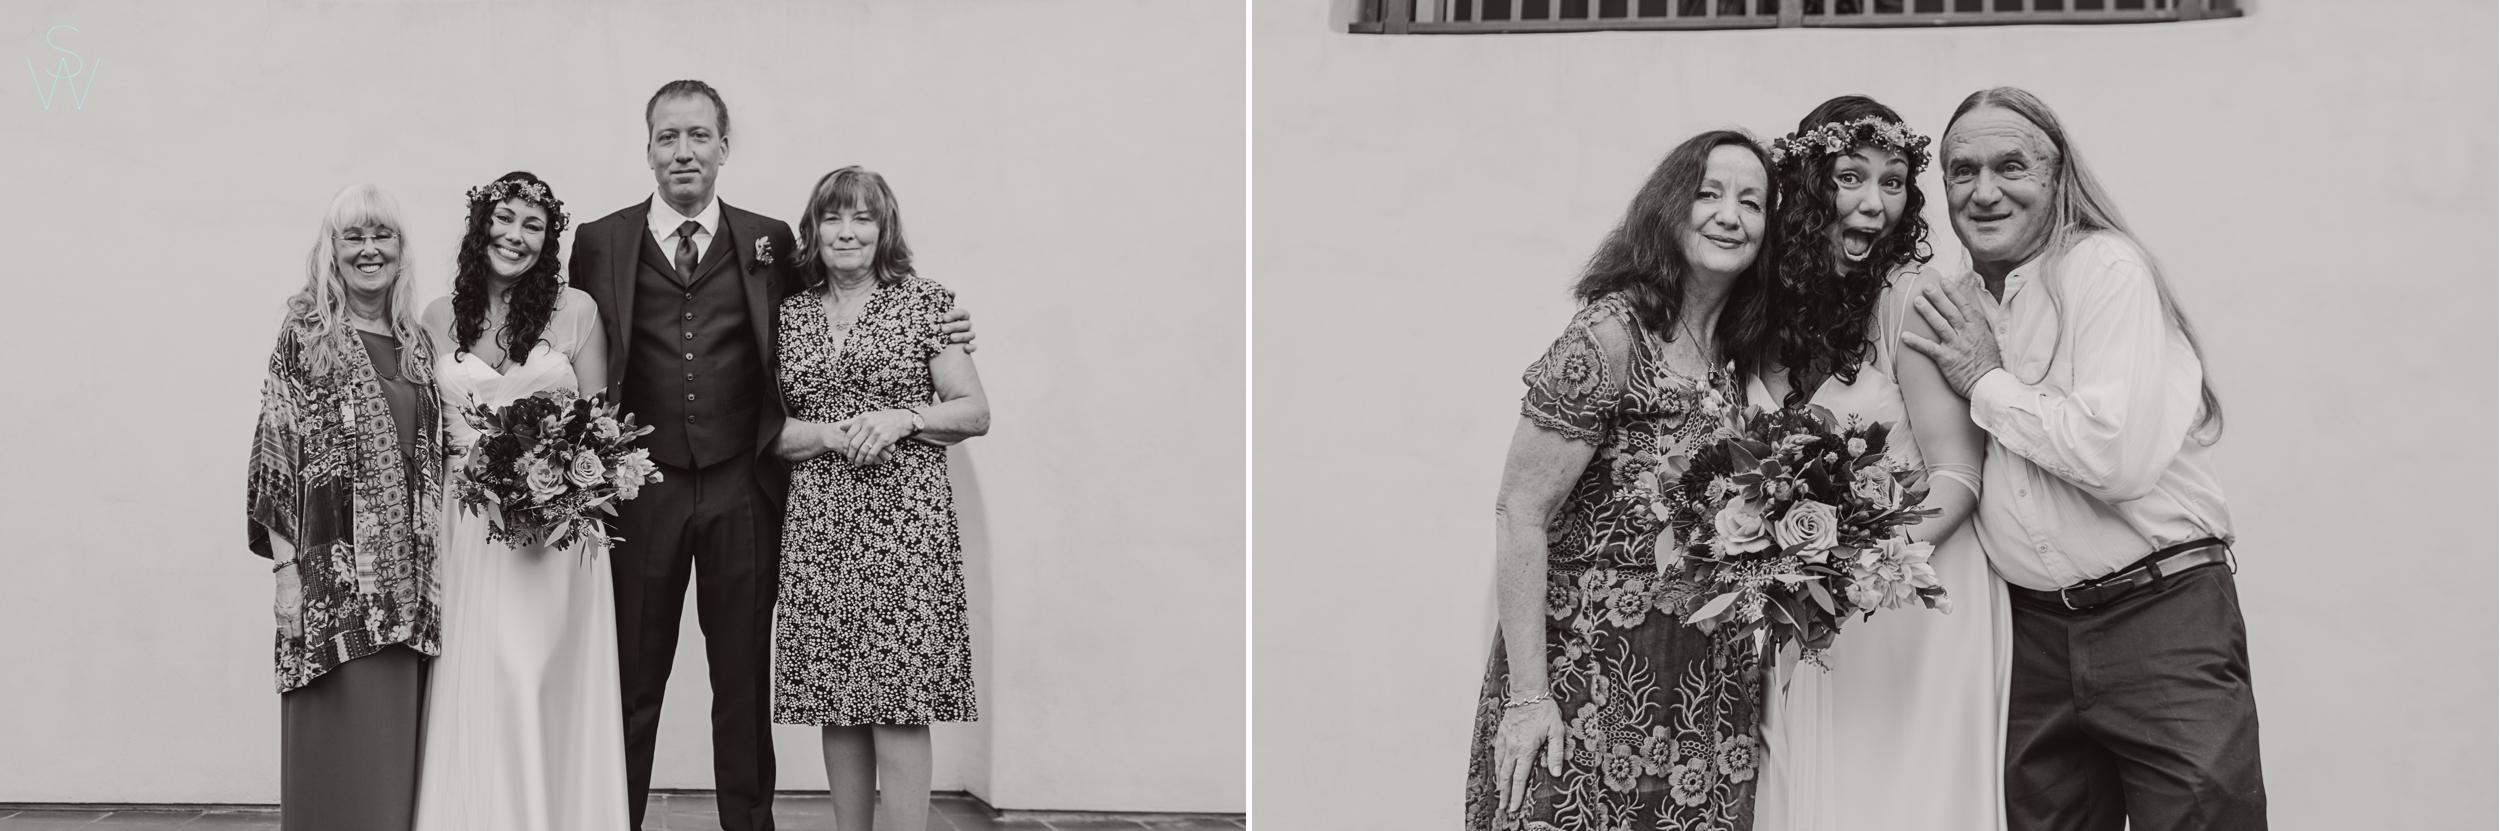 154Estancia.Shewanders.Wedding.Photography.JPG